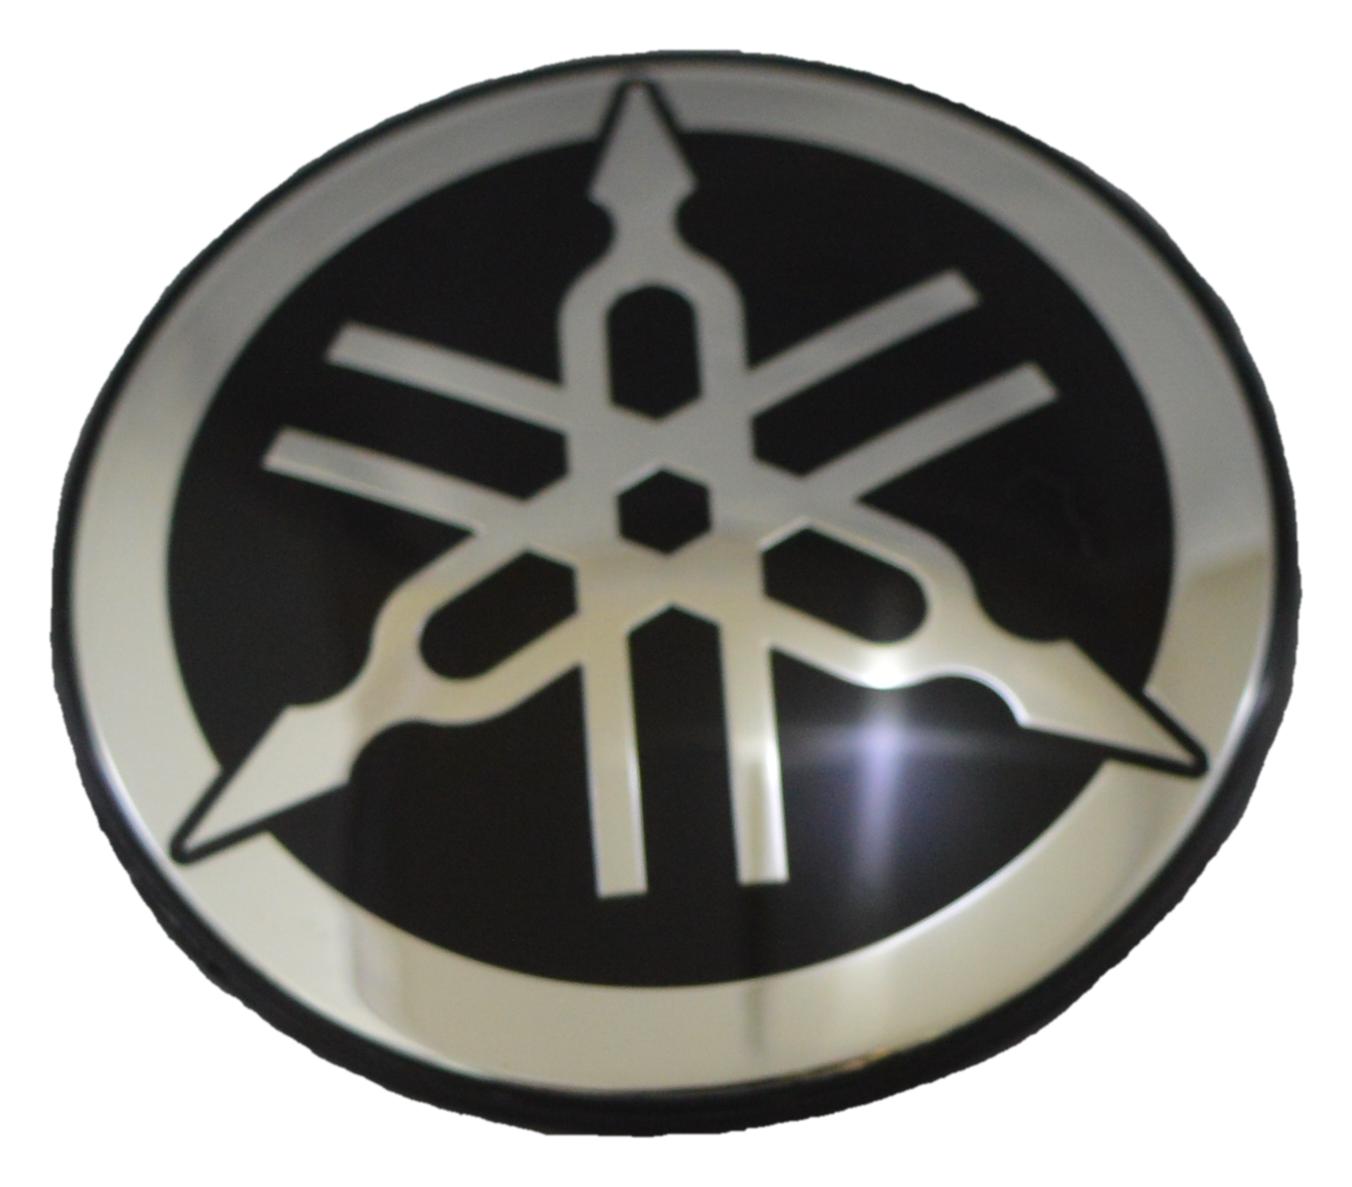 New OEM Yamaha Wave Runner PWC Round Logo Emblem Tuning Fork